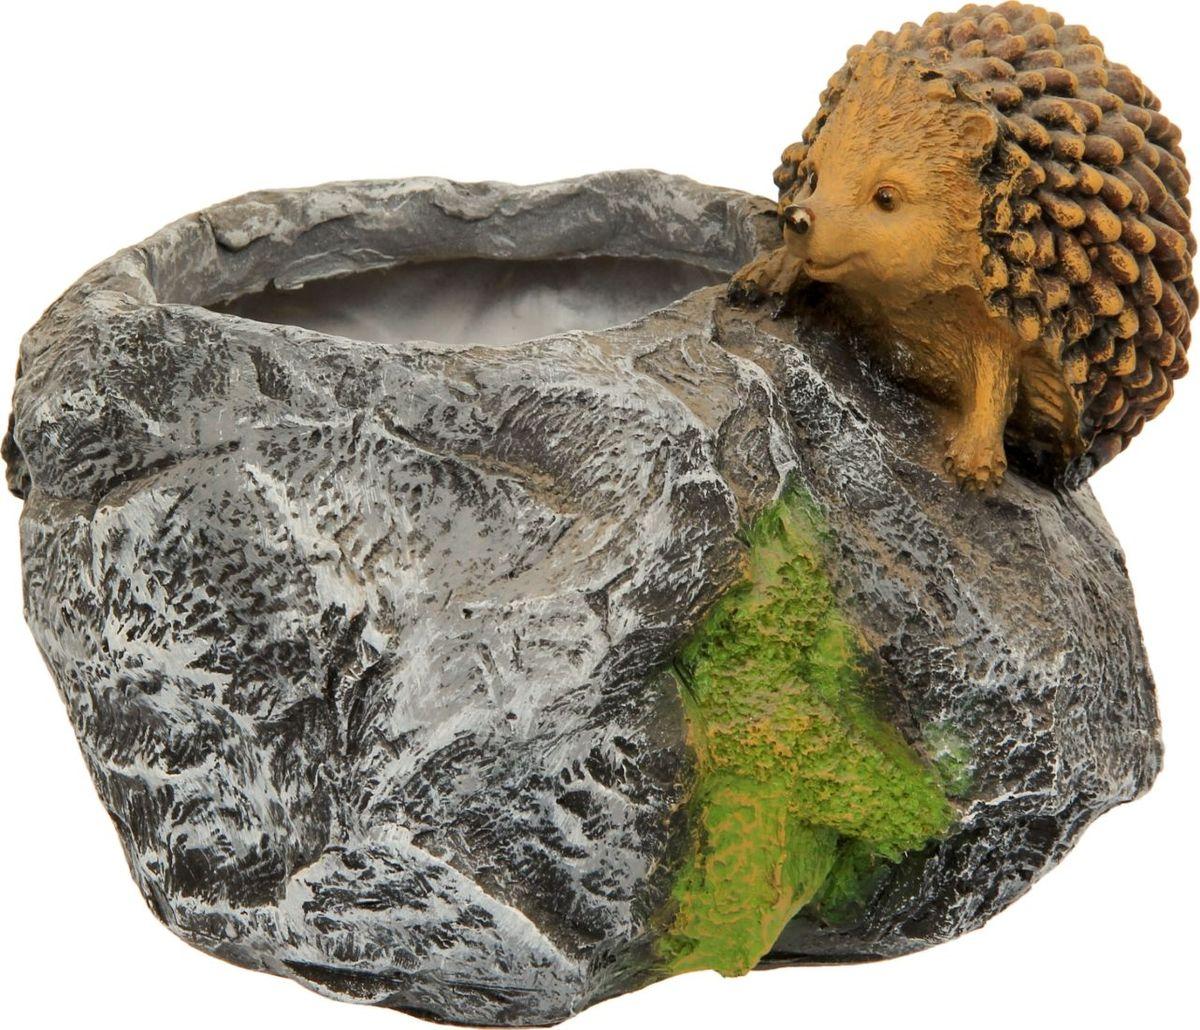 Кашпо  Камень с ежом , 16 х 15 х 18 см